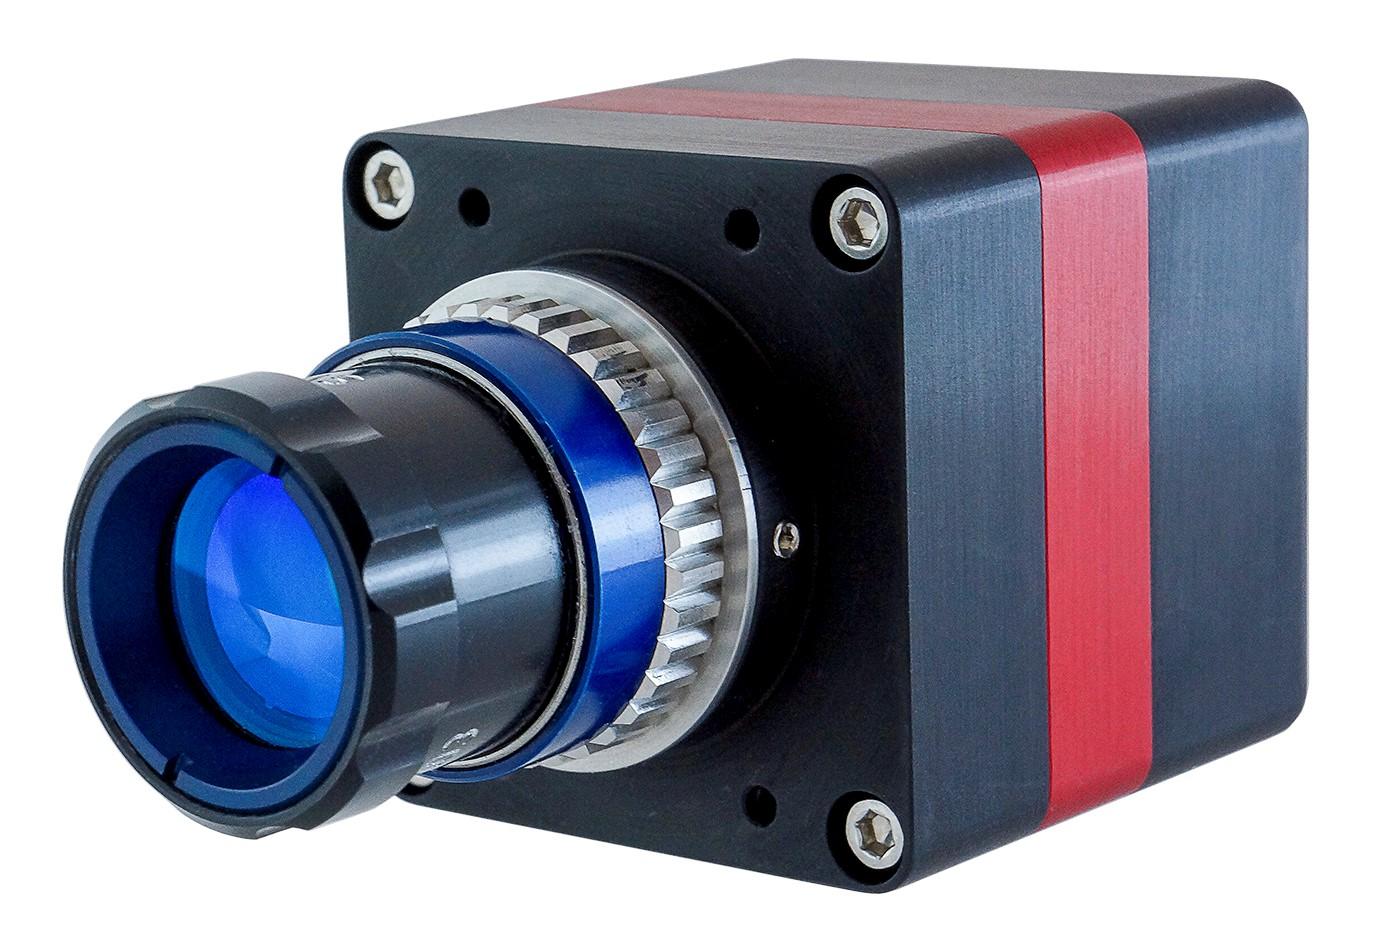 High resolution High Sensitivity Digital VIS-SWIR Camera Owl 1280